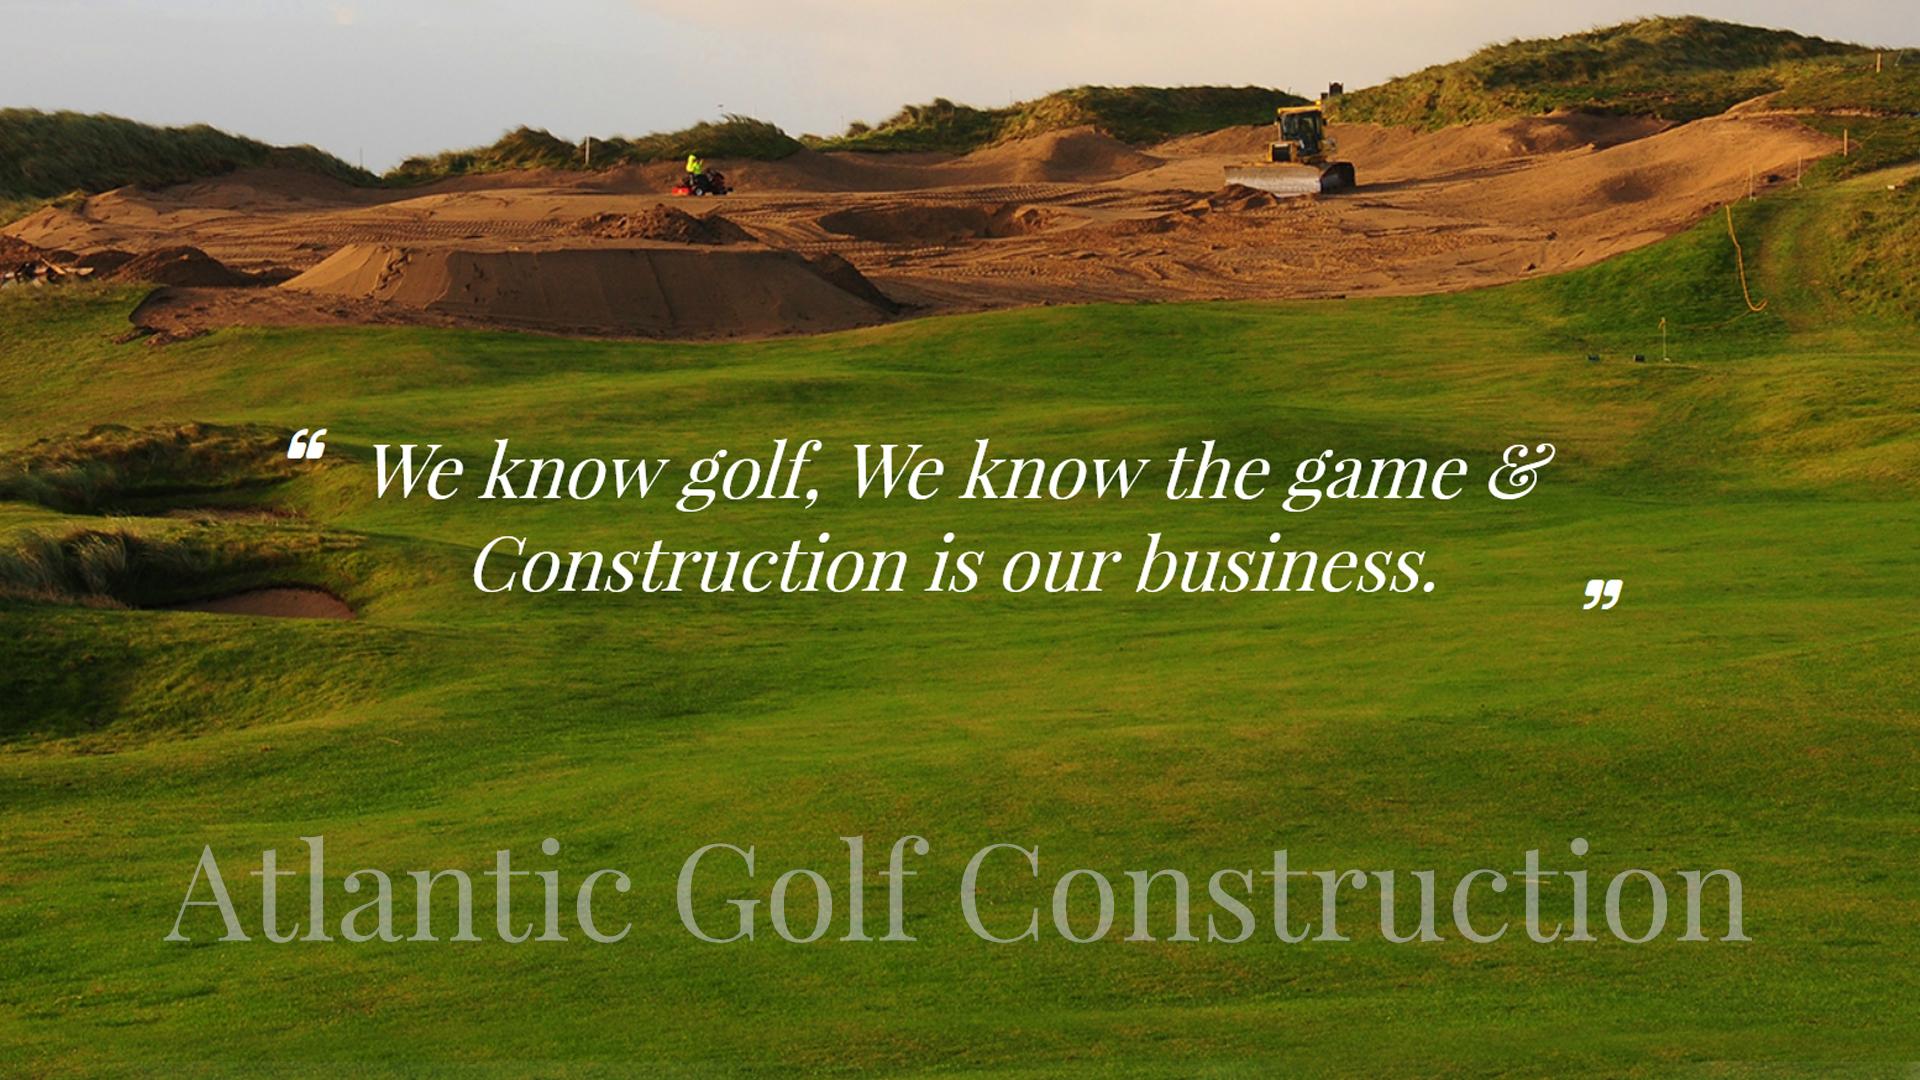 Atlantic-Golf-Construction-hero